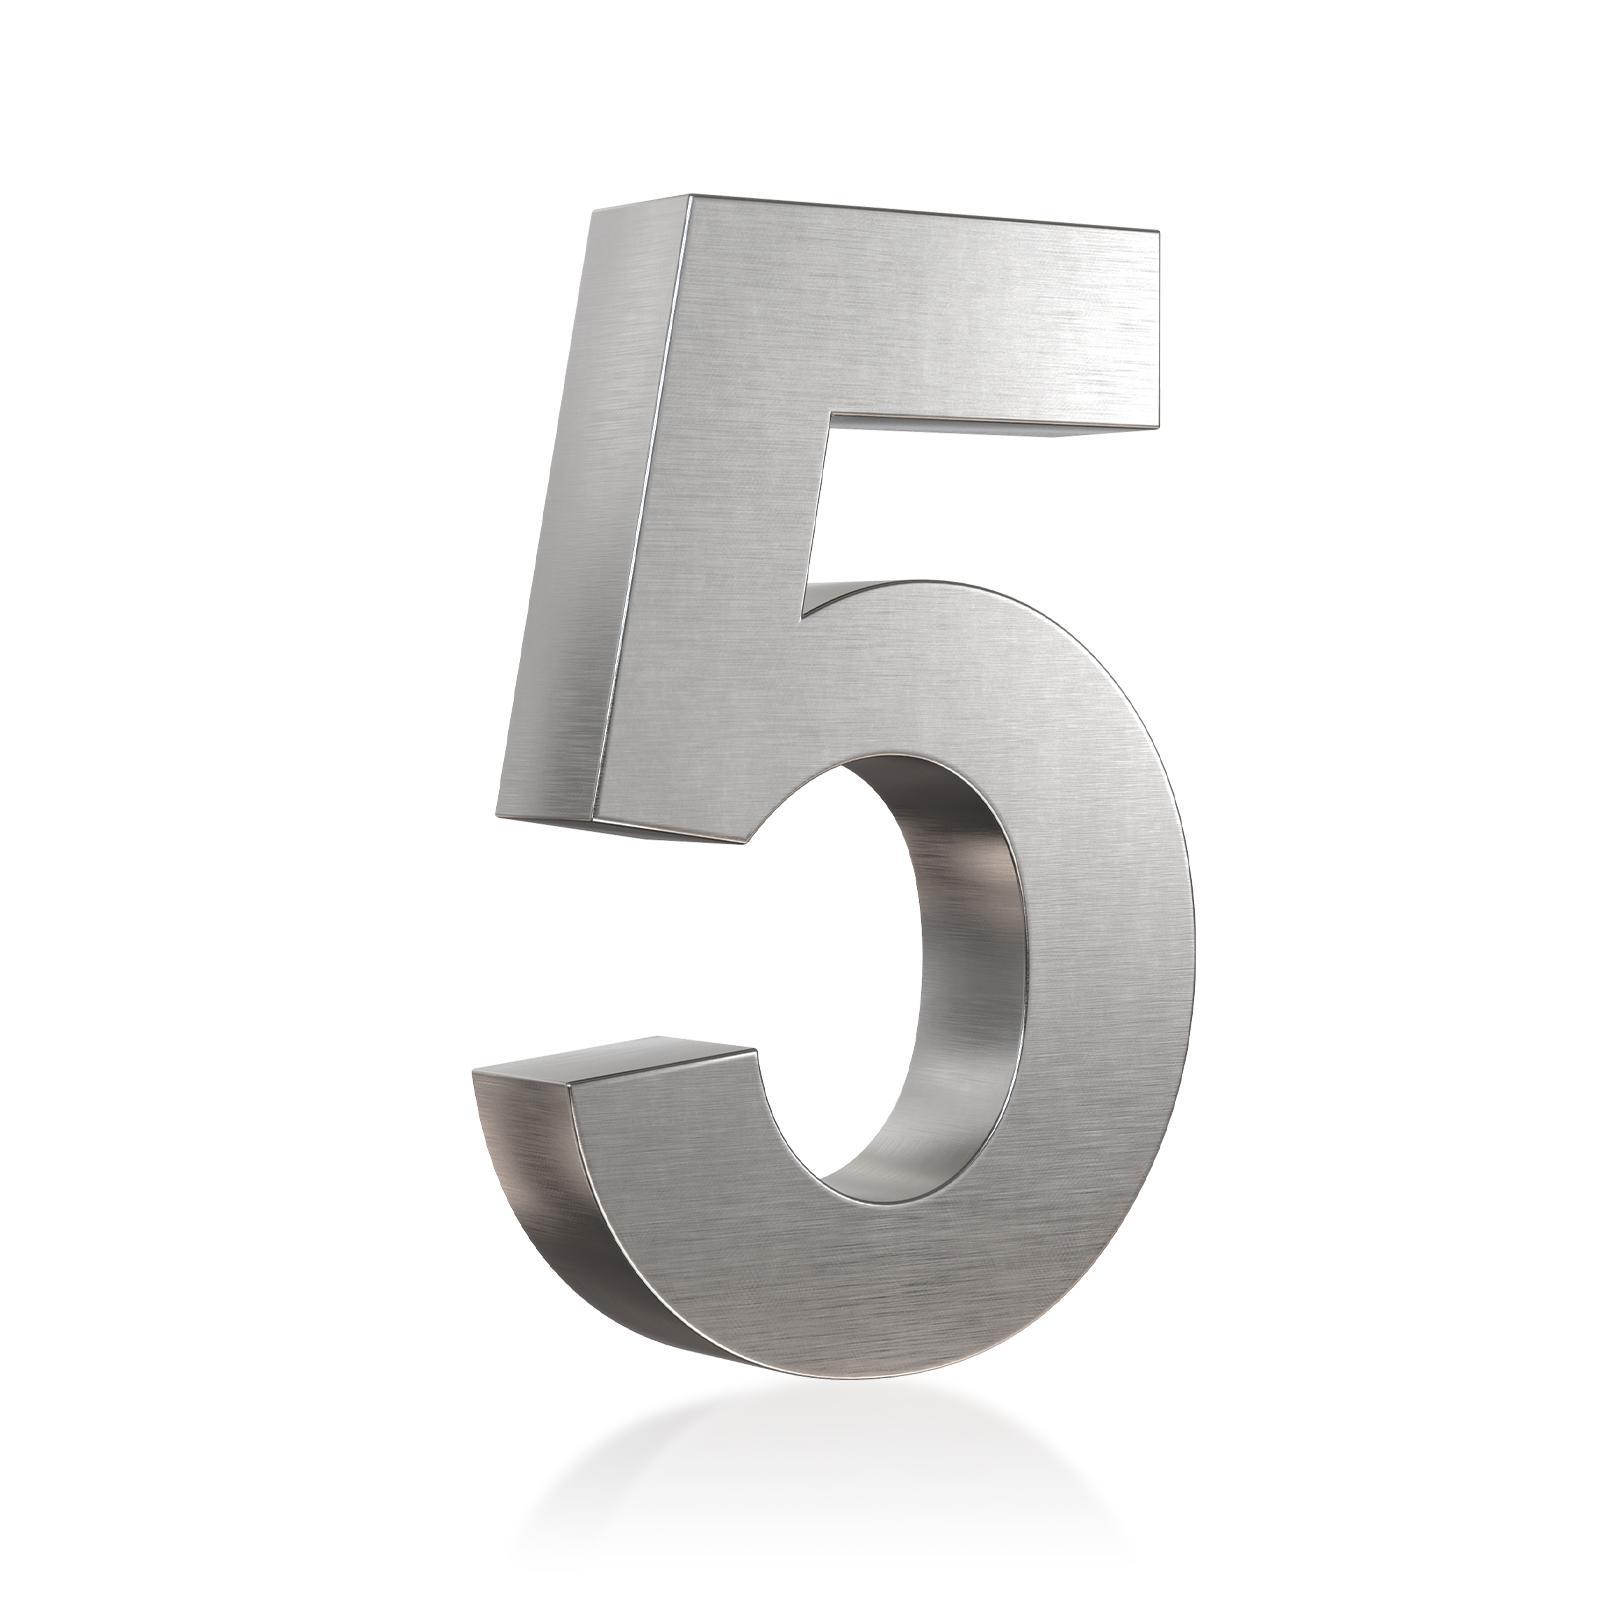 3D Hausnummer 5 Edelstahl in 3D Design Arial V2A